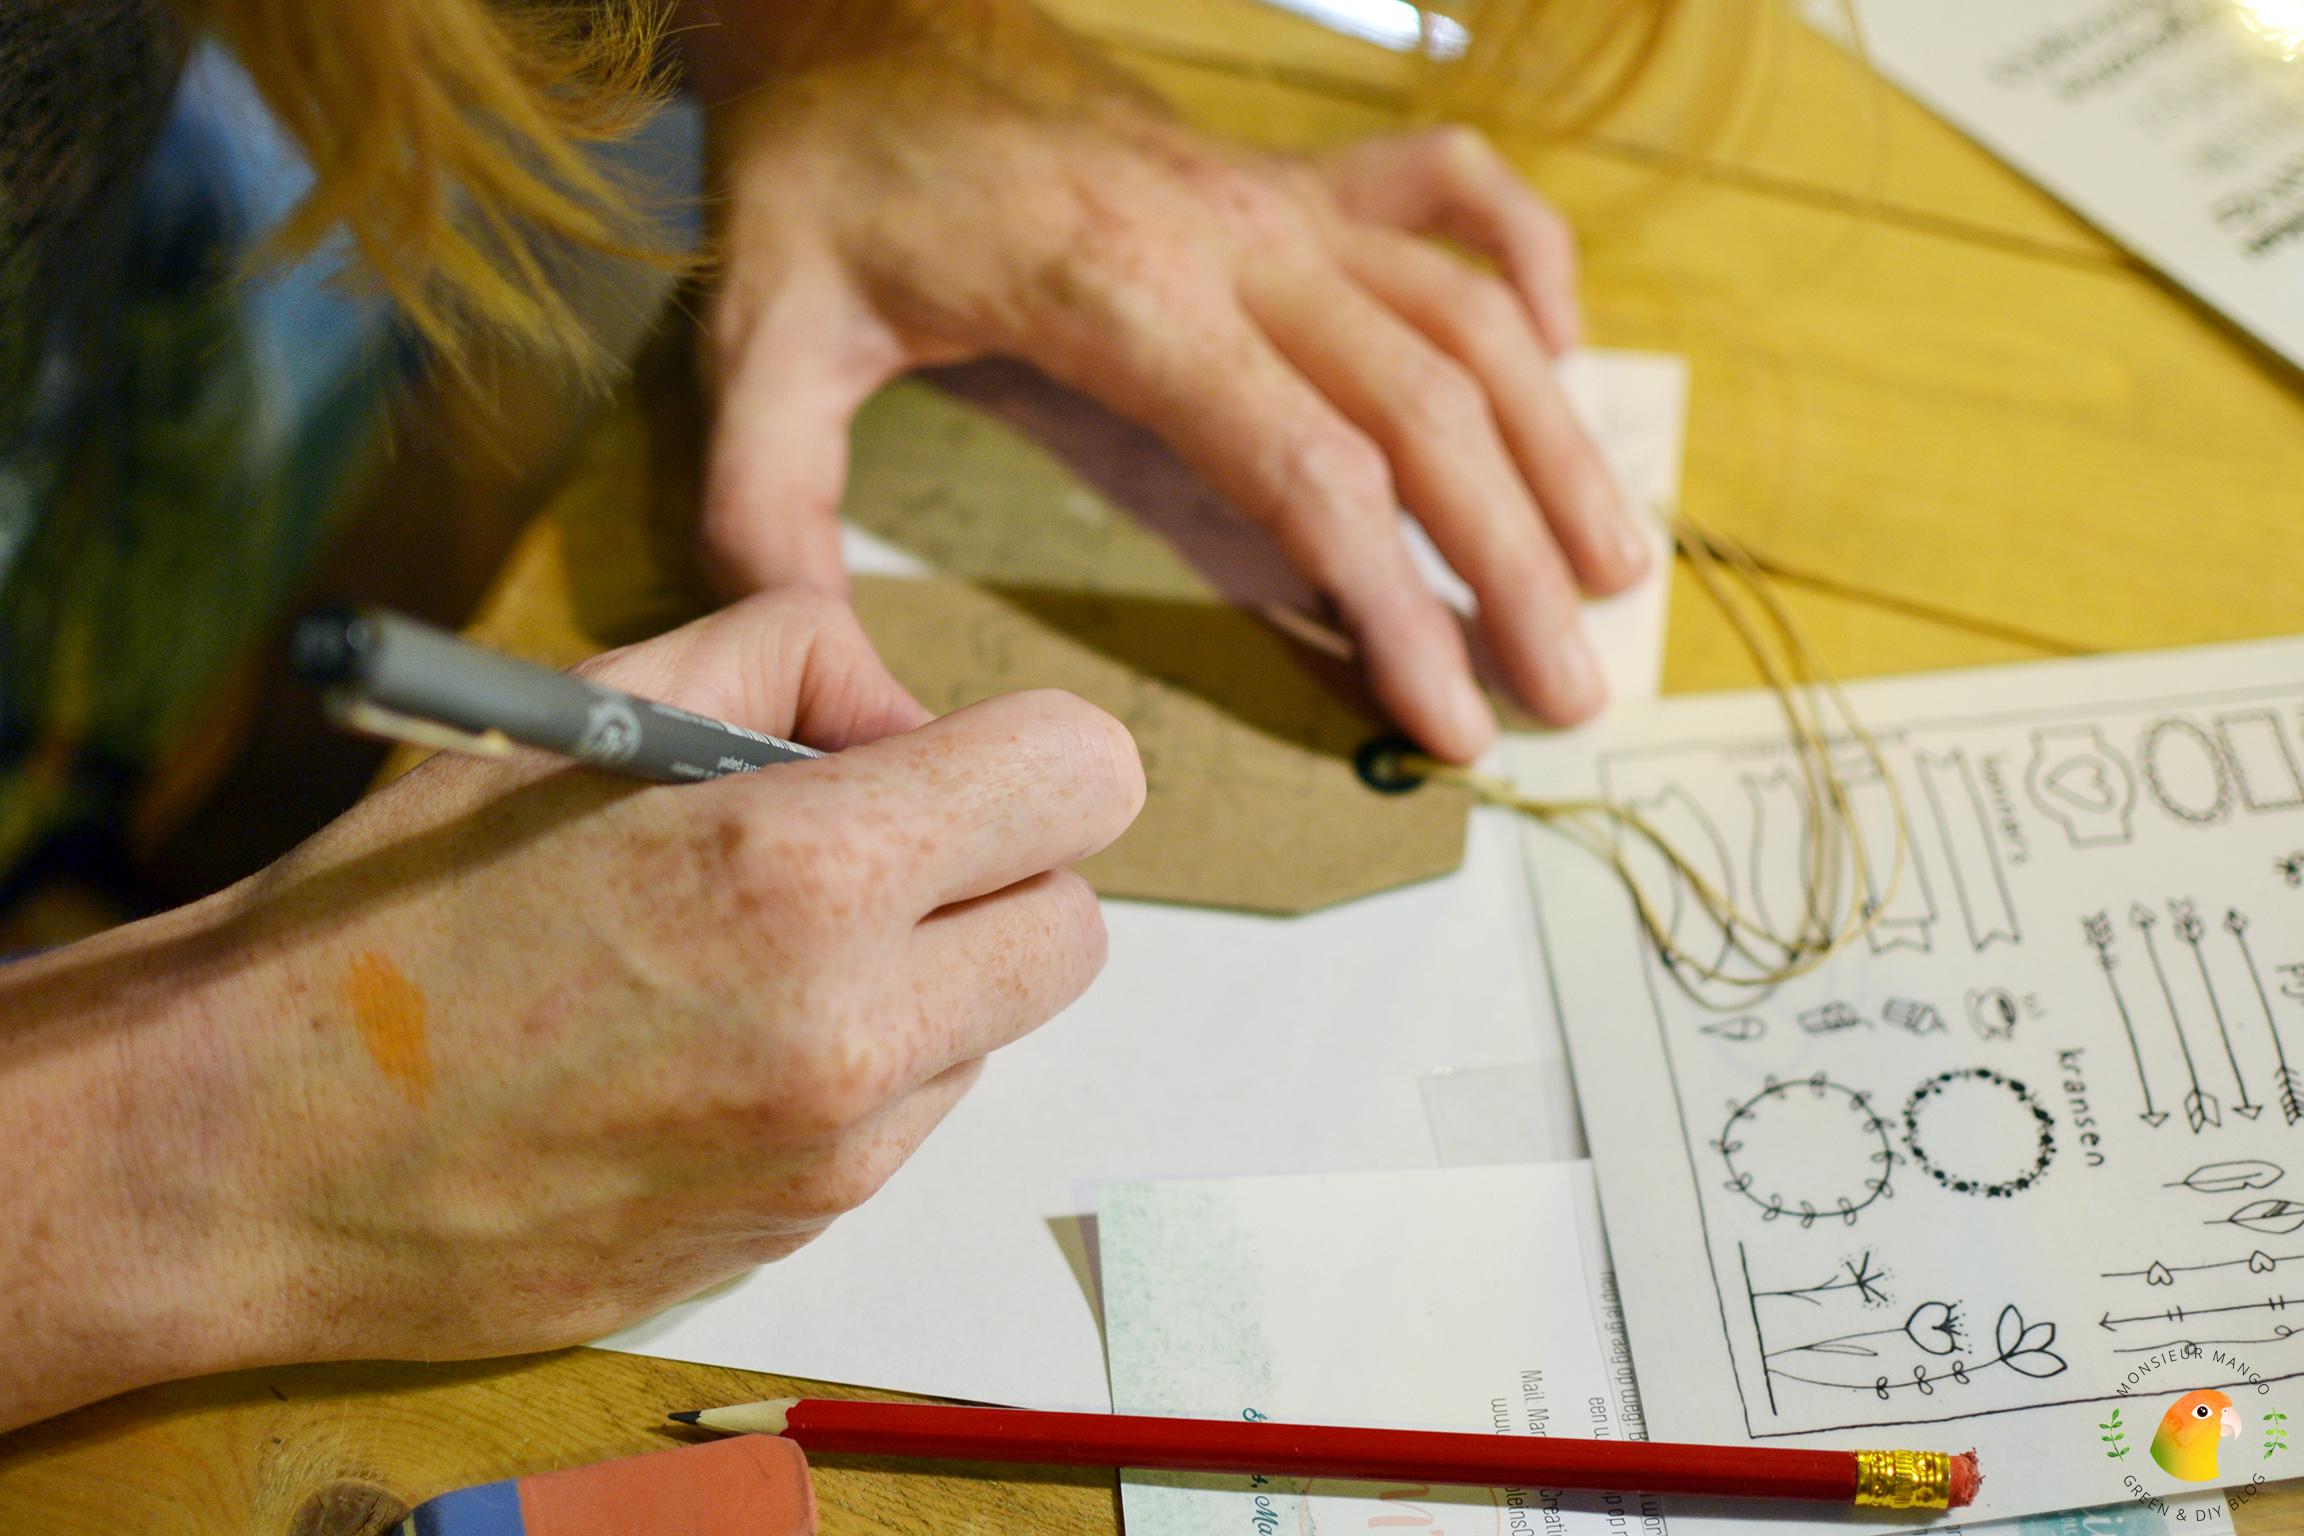 Afbeelding PaperPassion Marjolein's Creations handlettering workshop op kaartje